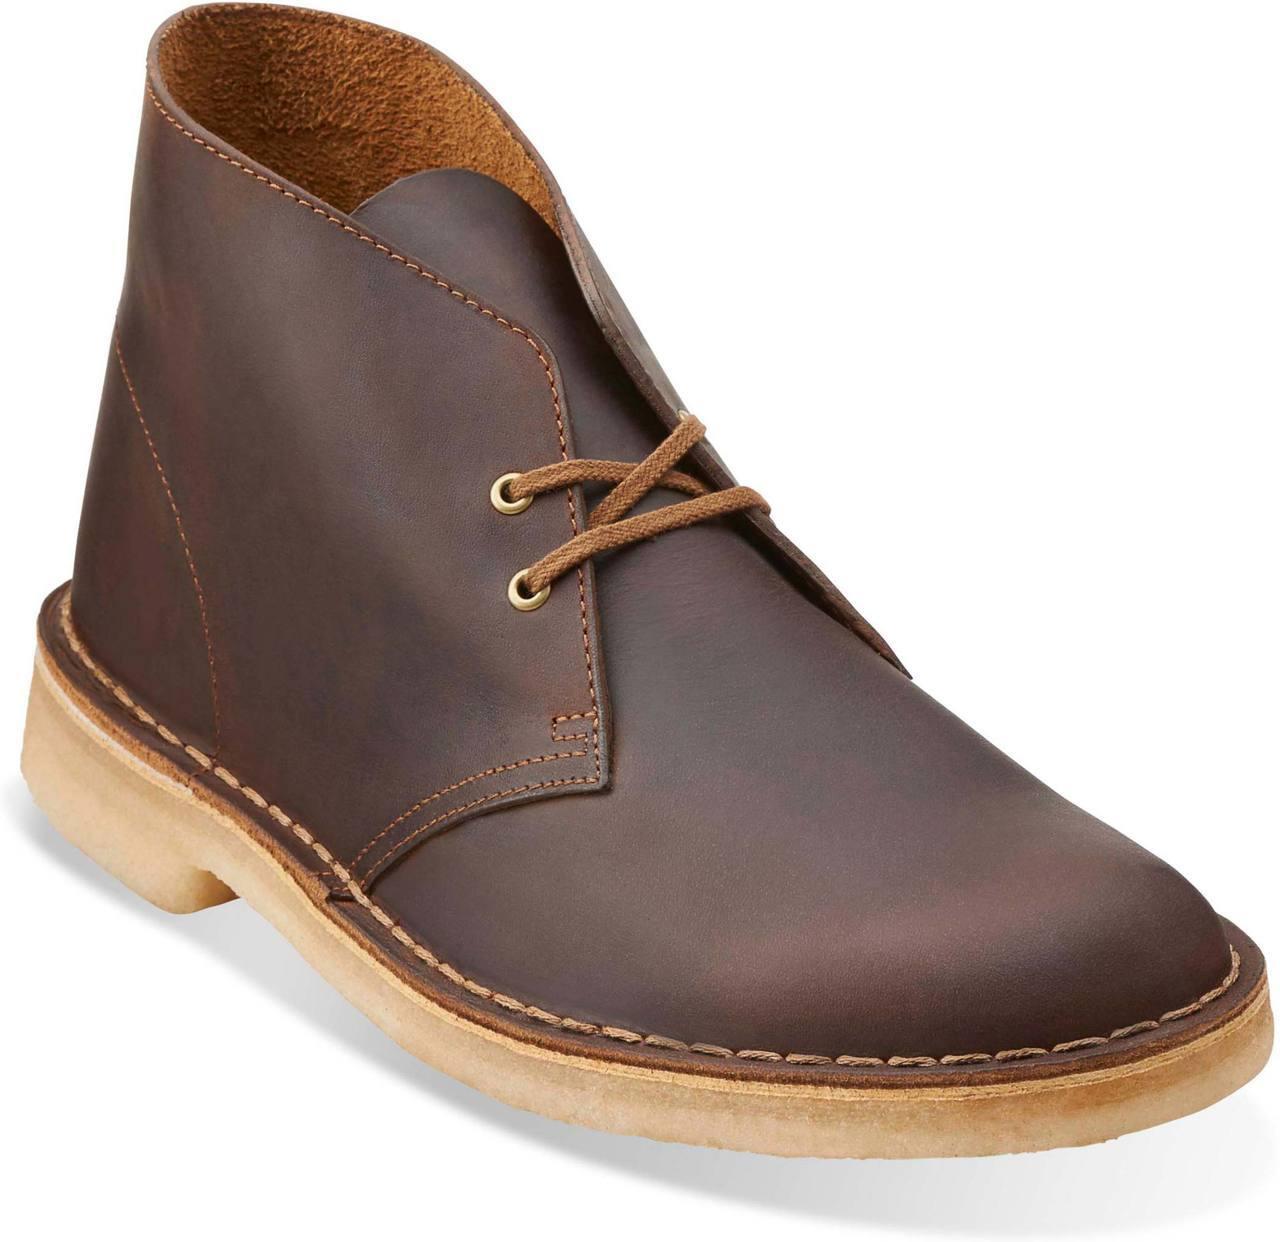 Clarks Men's Desert Boot in Beeswax Leather